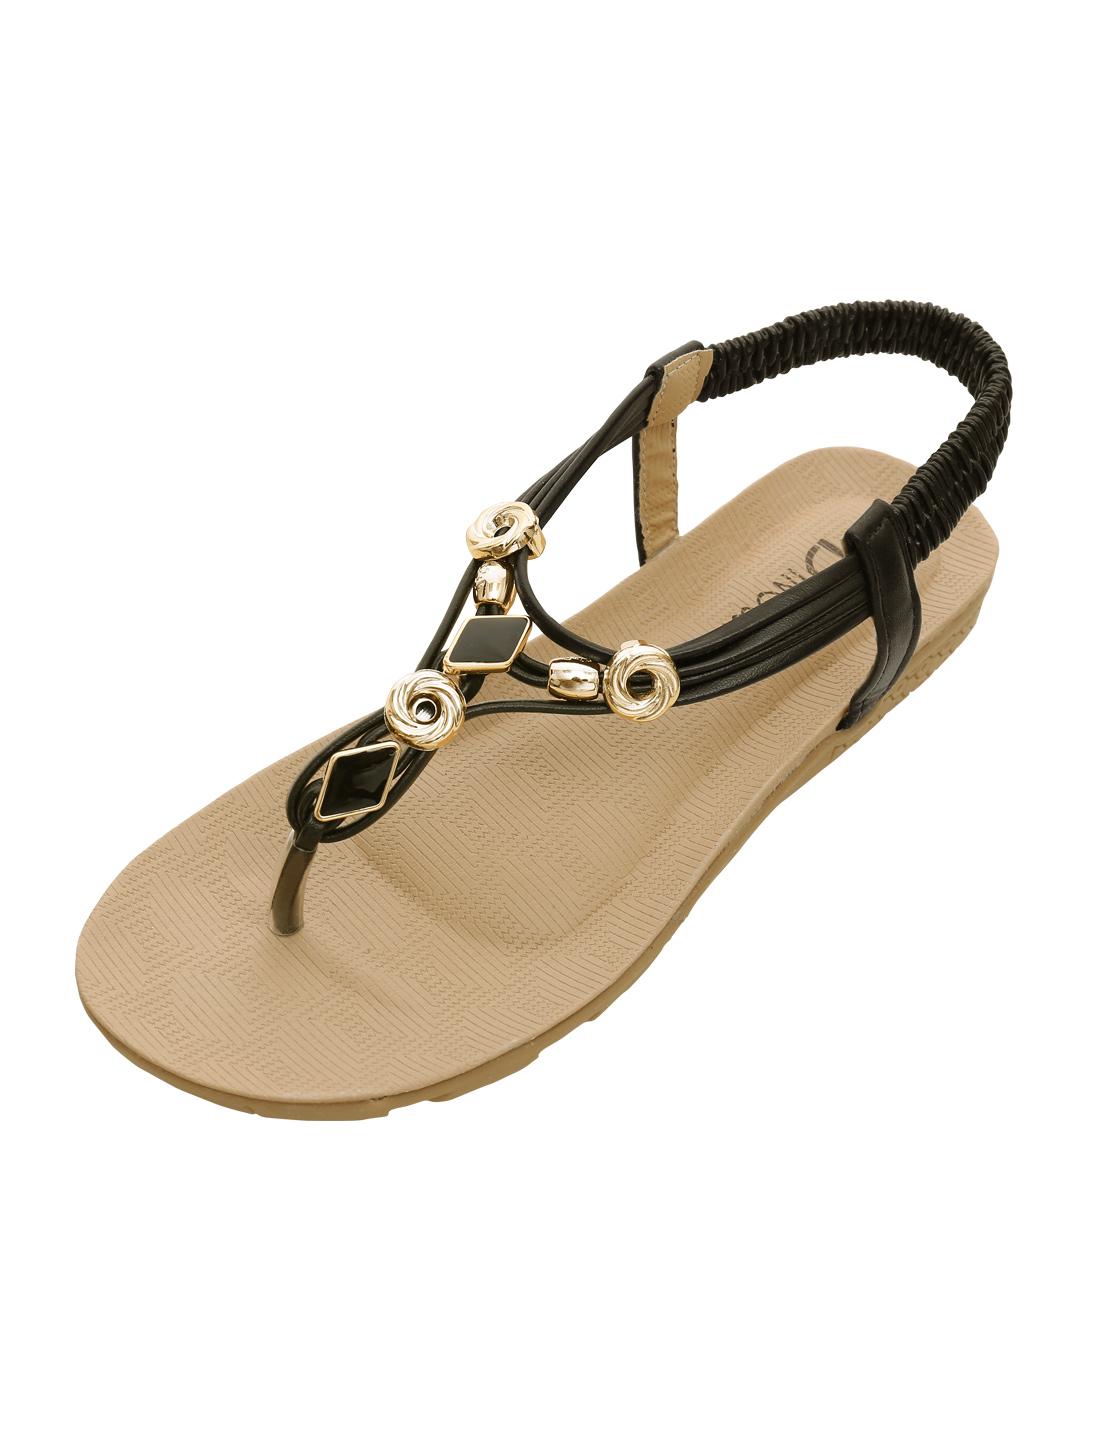 Ladies Classic Open Post Ankle Straps Rhinestones Sandals Black US 7